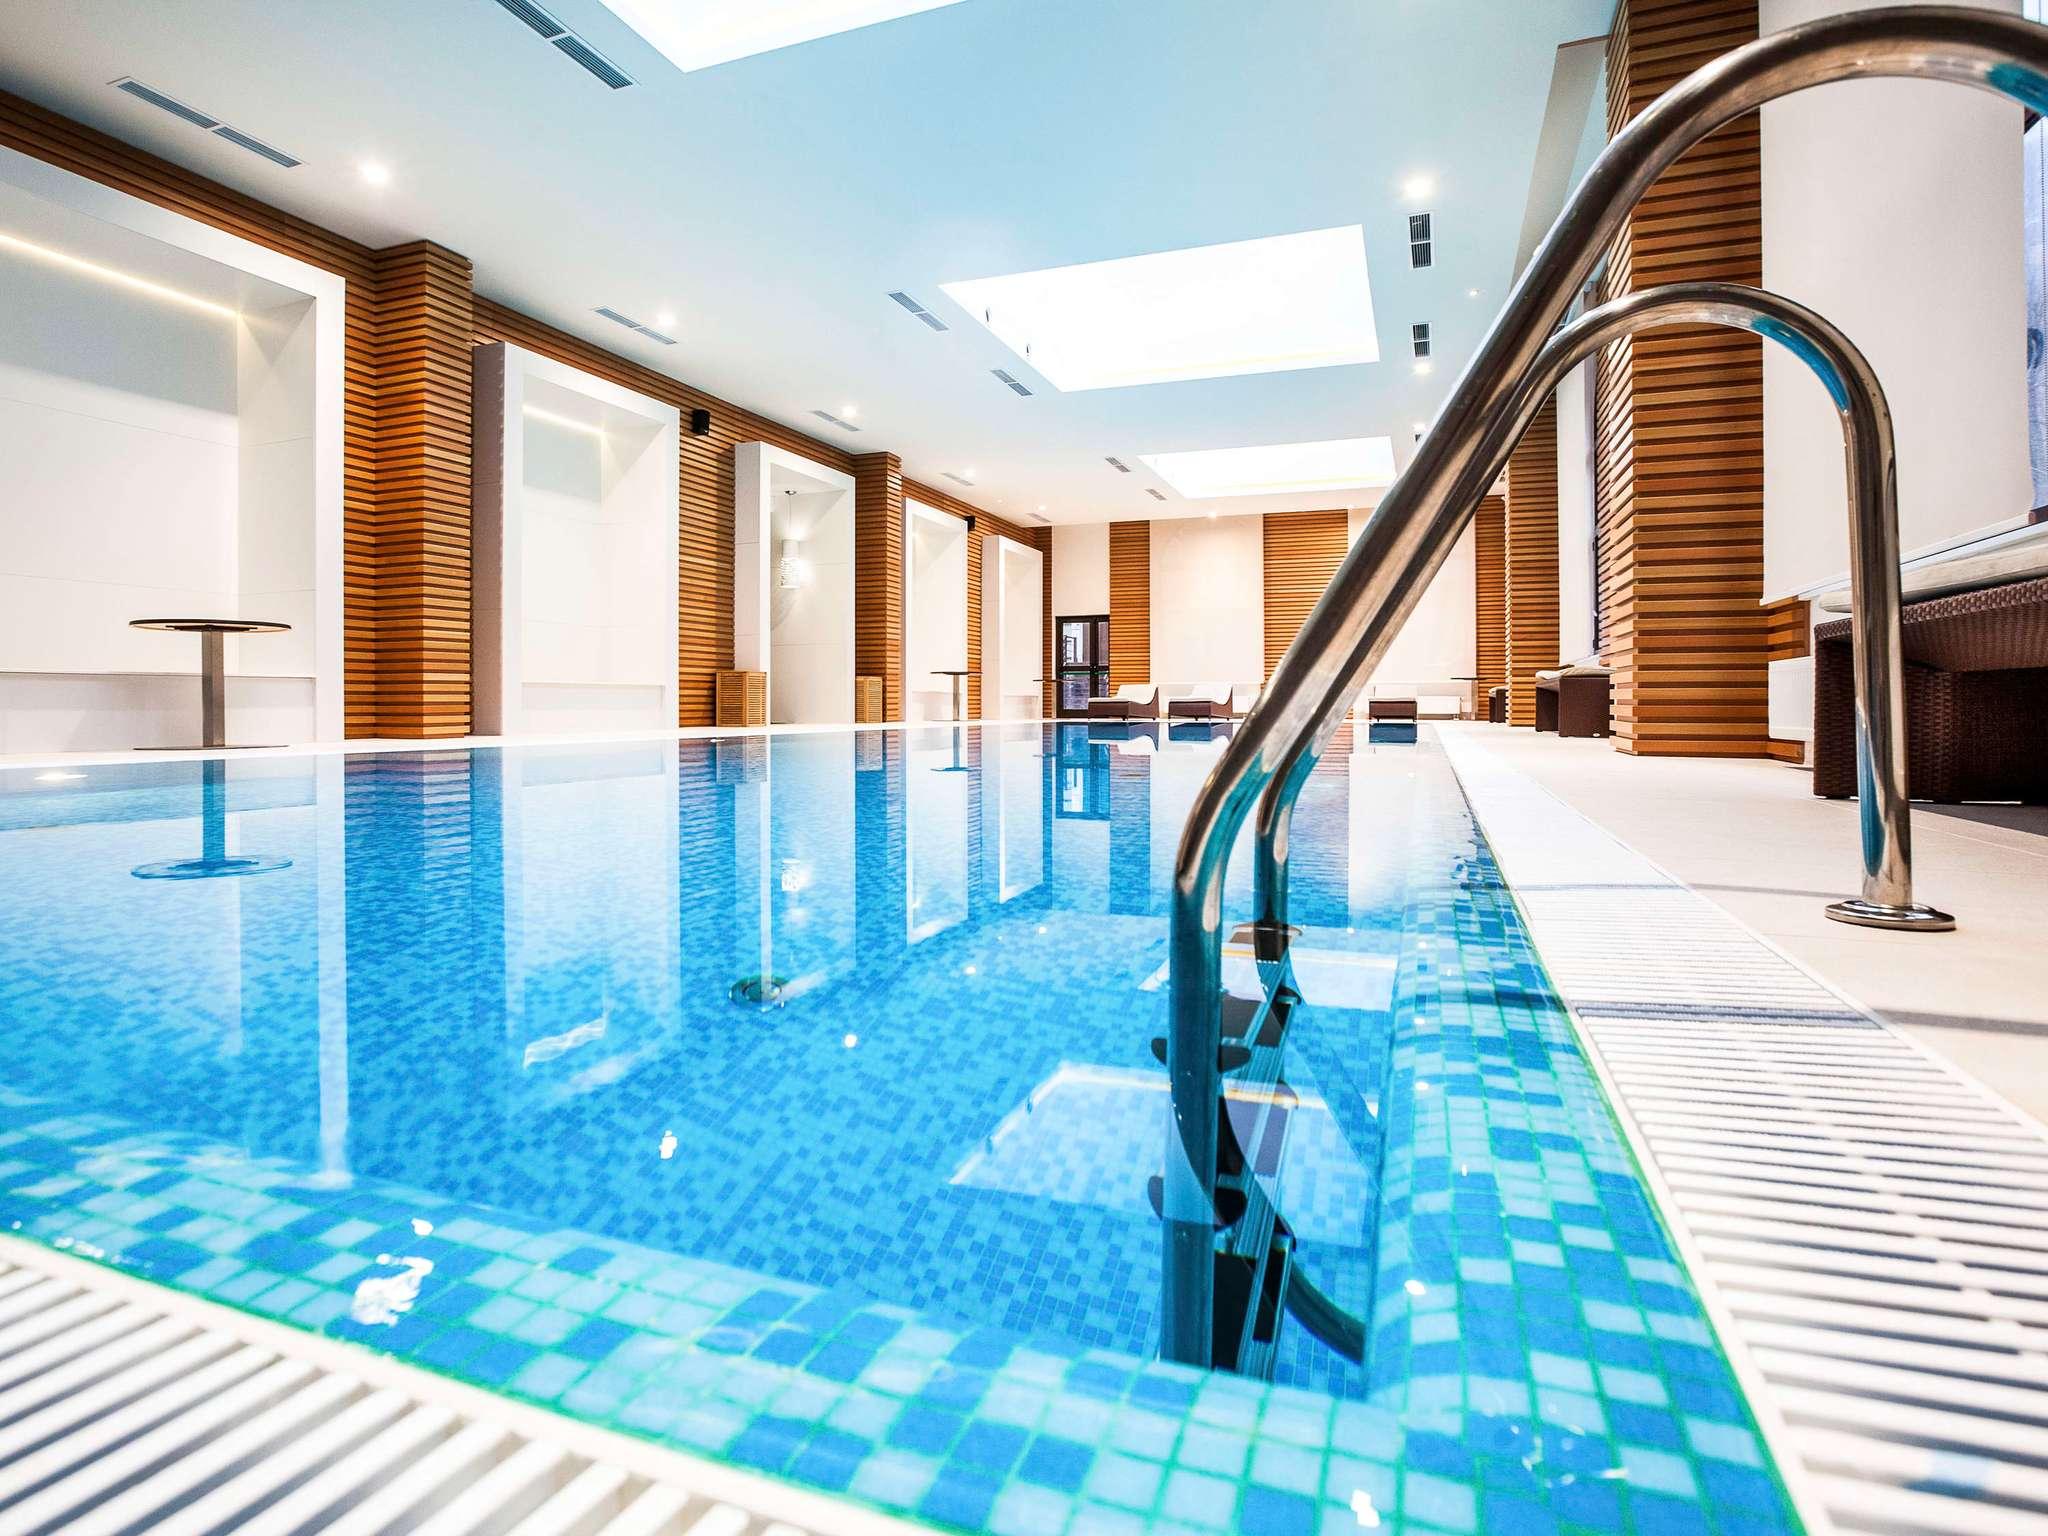 Hotel – Mercure Rosa Khutor Hotel